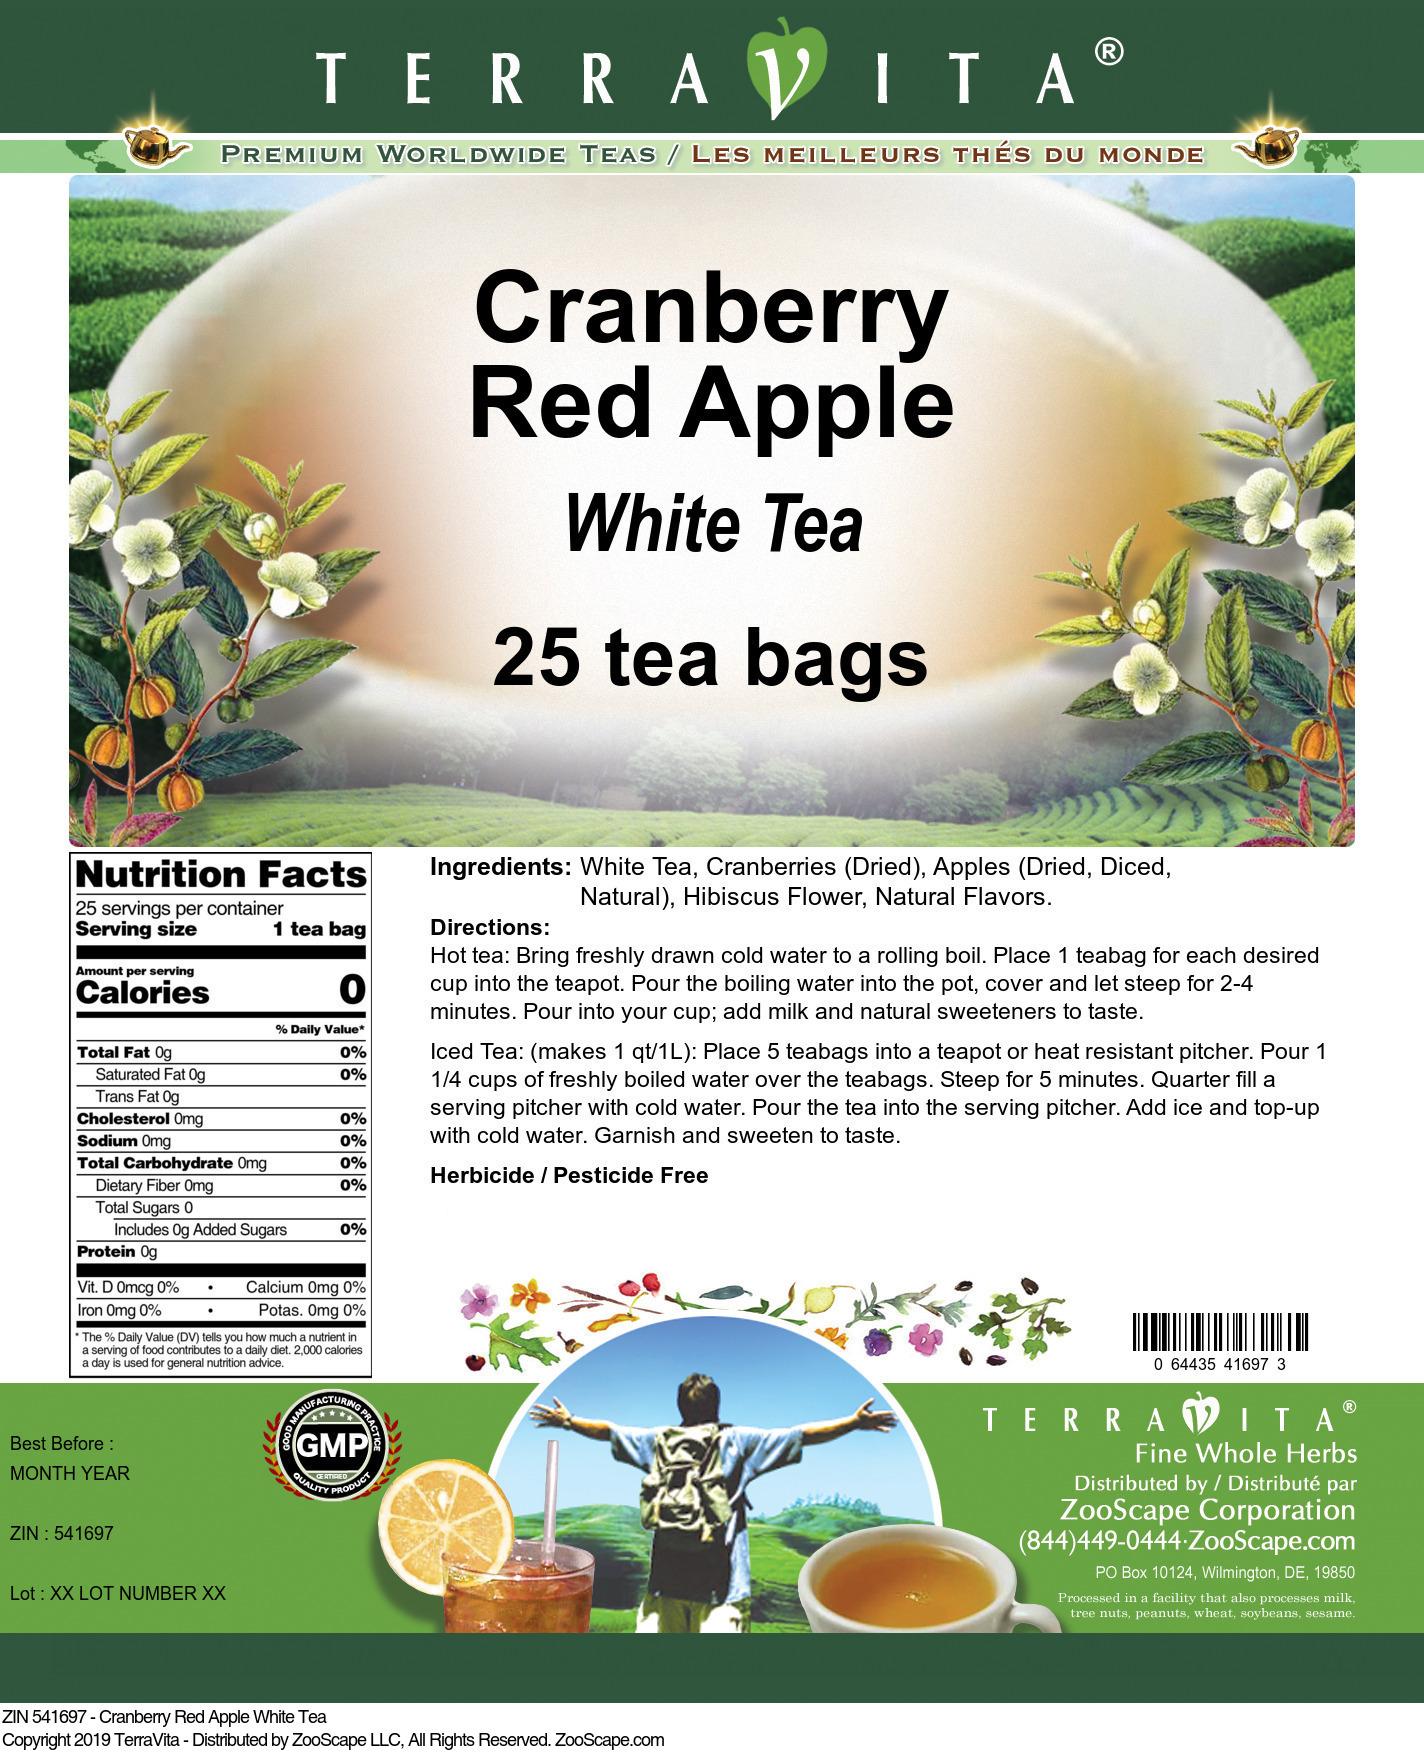 Cranberry Red Apple White Tea